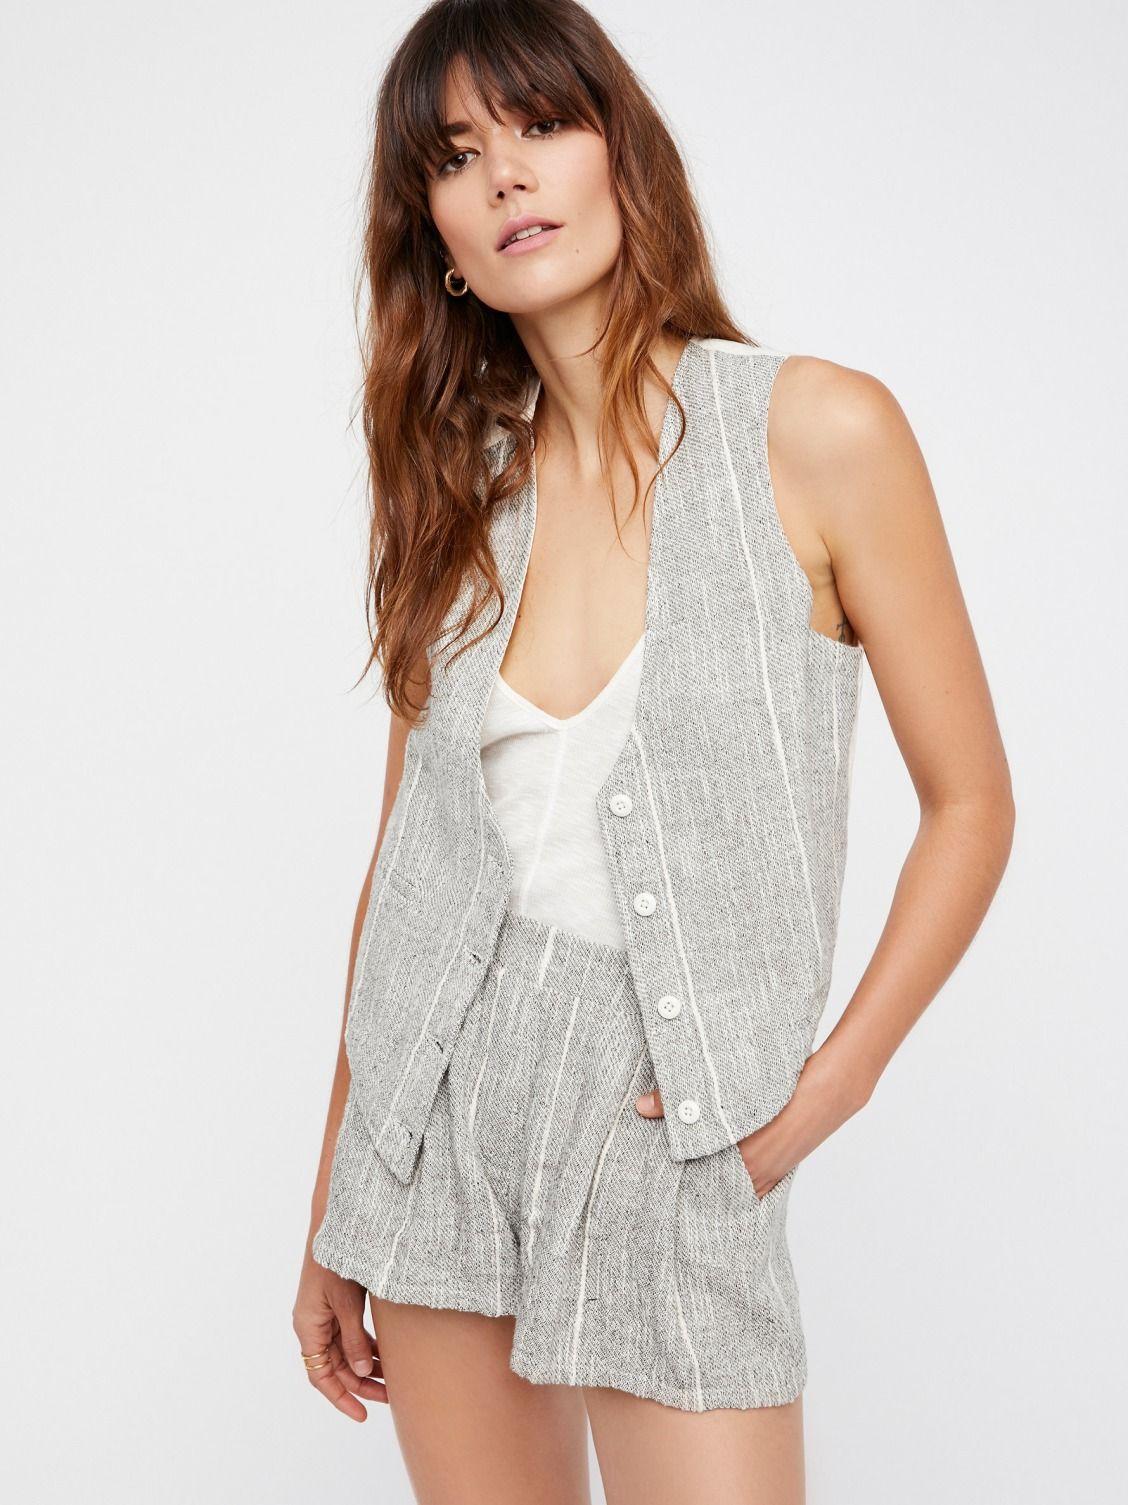 Vest u short suit at free people clothing boutique fashion